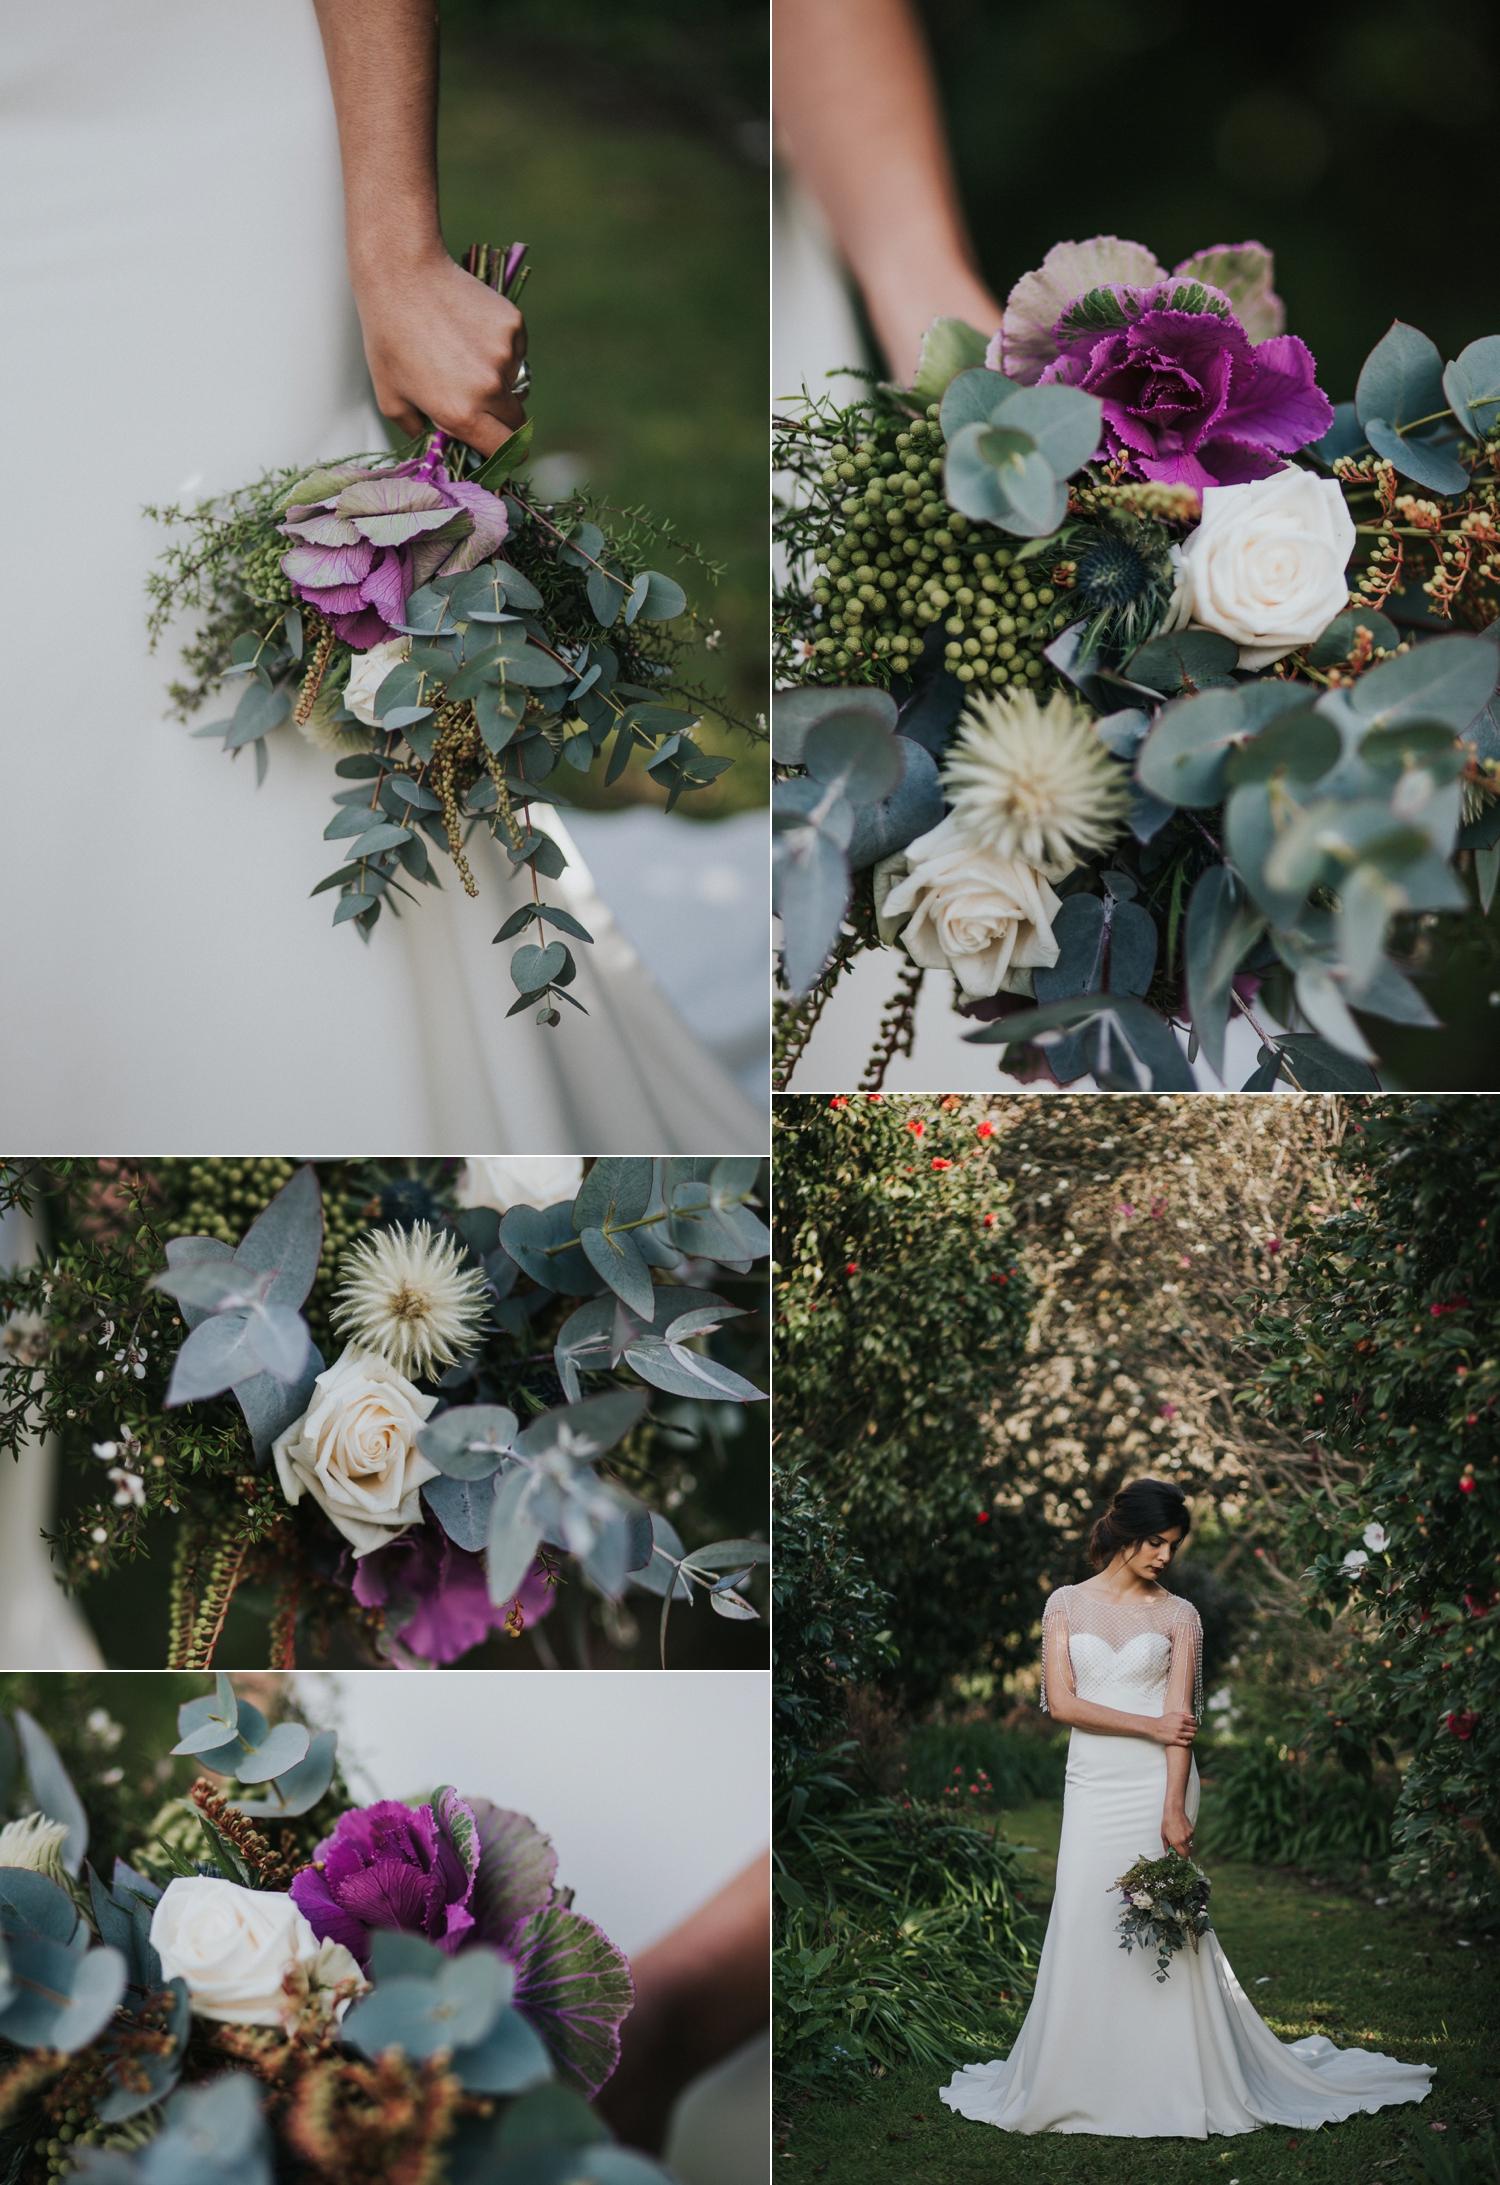 Styled Wedding Auckland Wedding Photographer 008.JPG